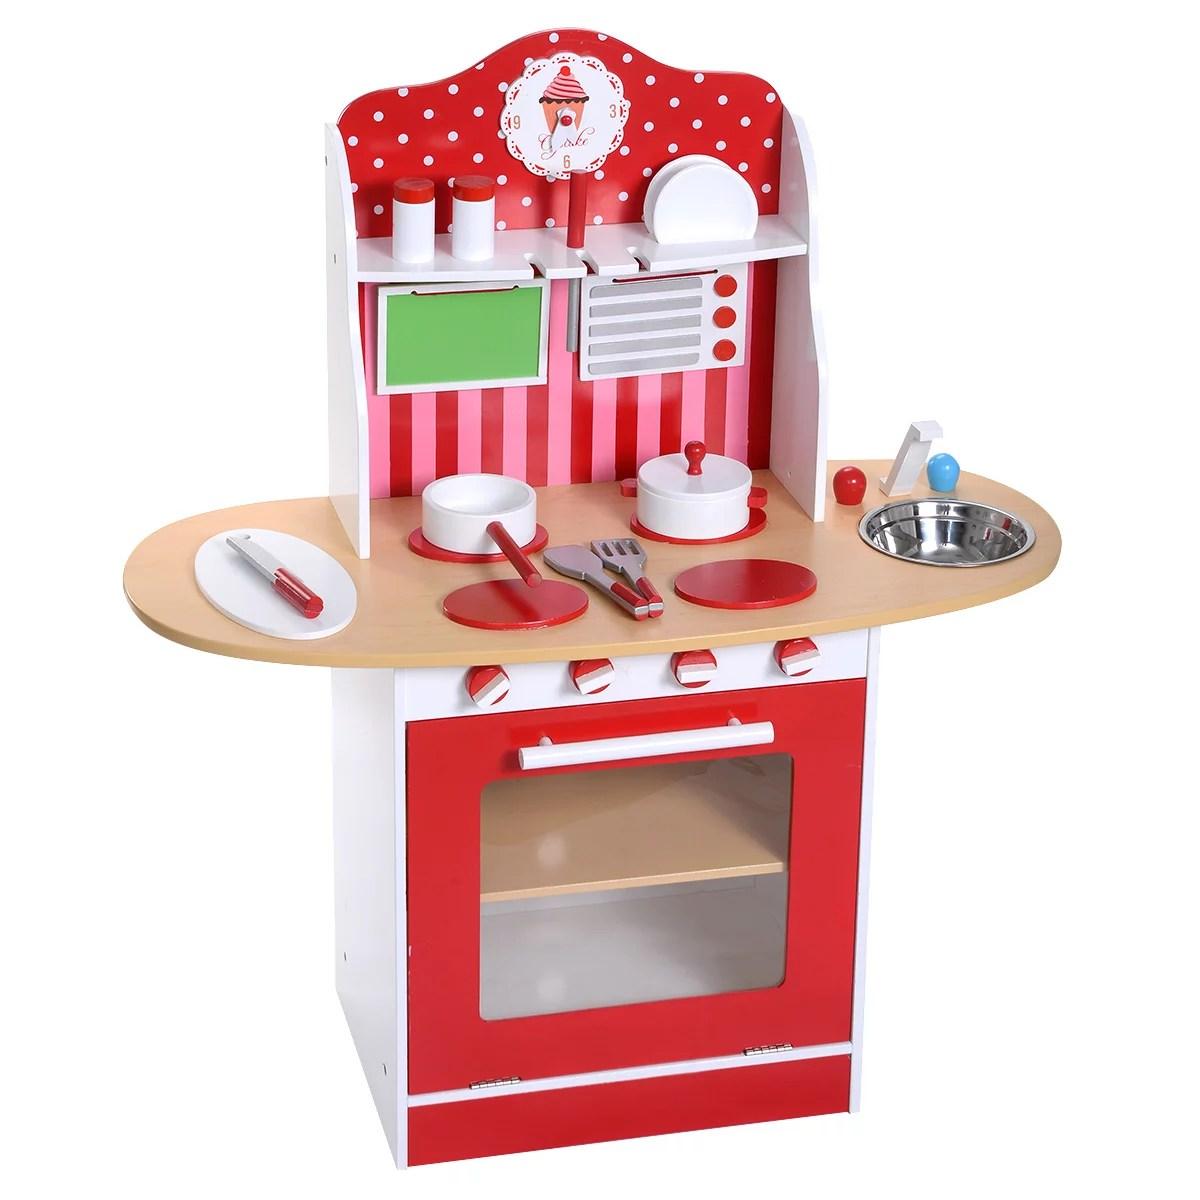 Costway New Kids Wood Kitchen Toy Cooking Pretend Play Set